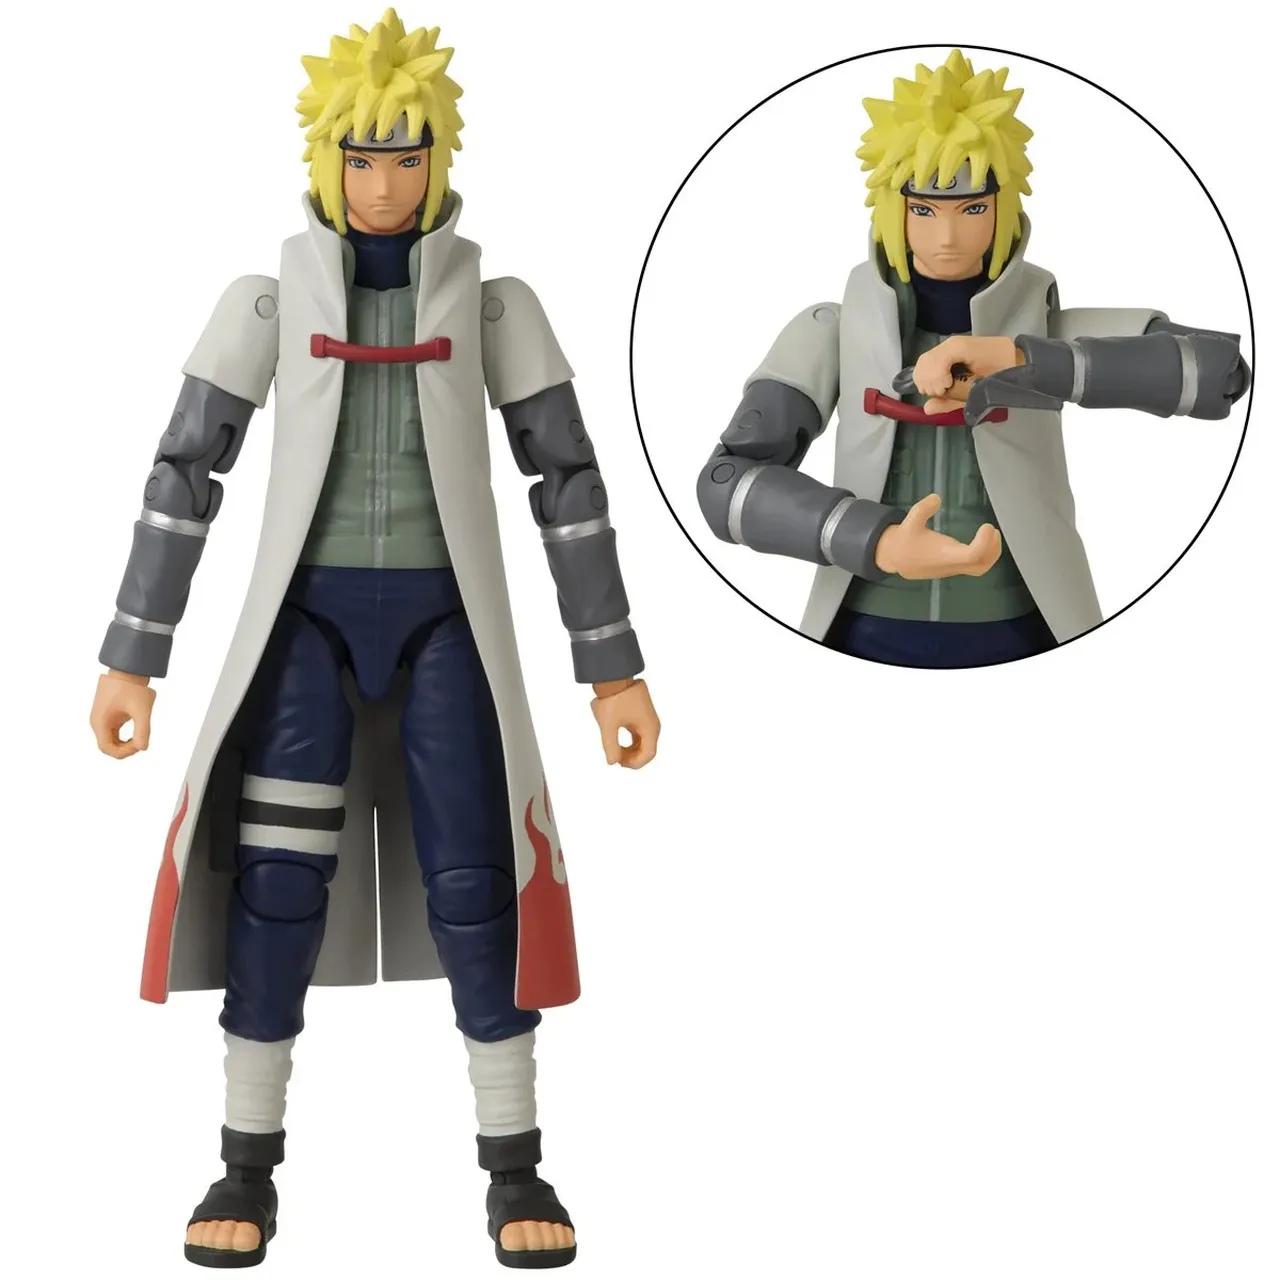 Action Figure Minato Namikaze: Naruto Shippuden (Anime Heroes) Anime Mangá - Bandai